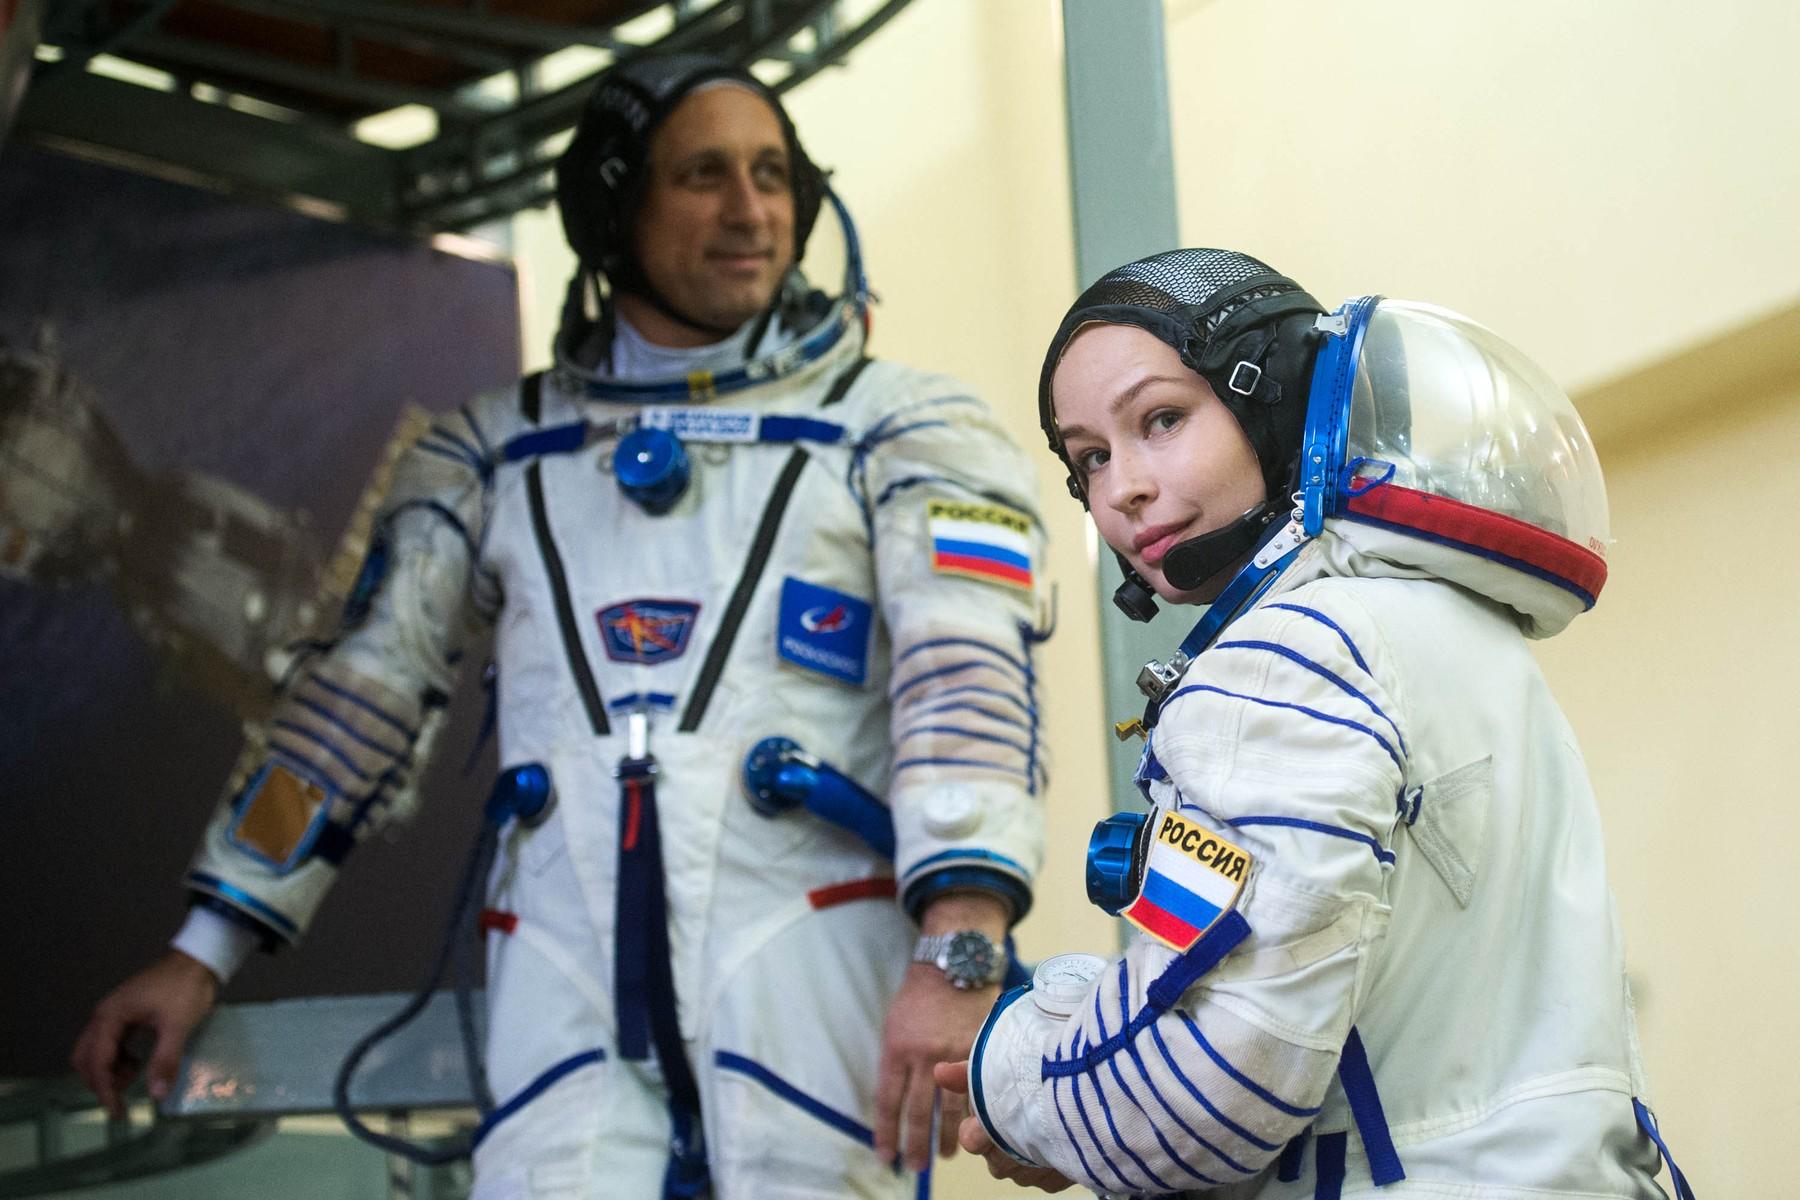 Rusija, snimanje, film, prvi film u svemiru, svemir